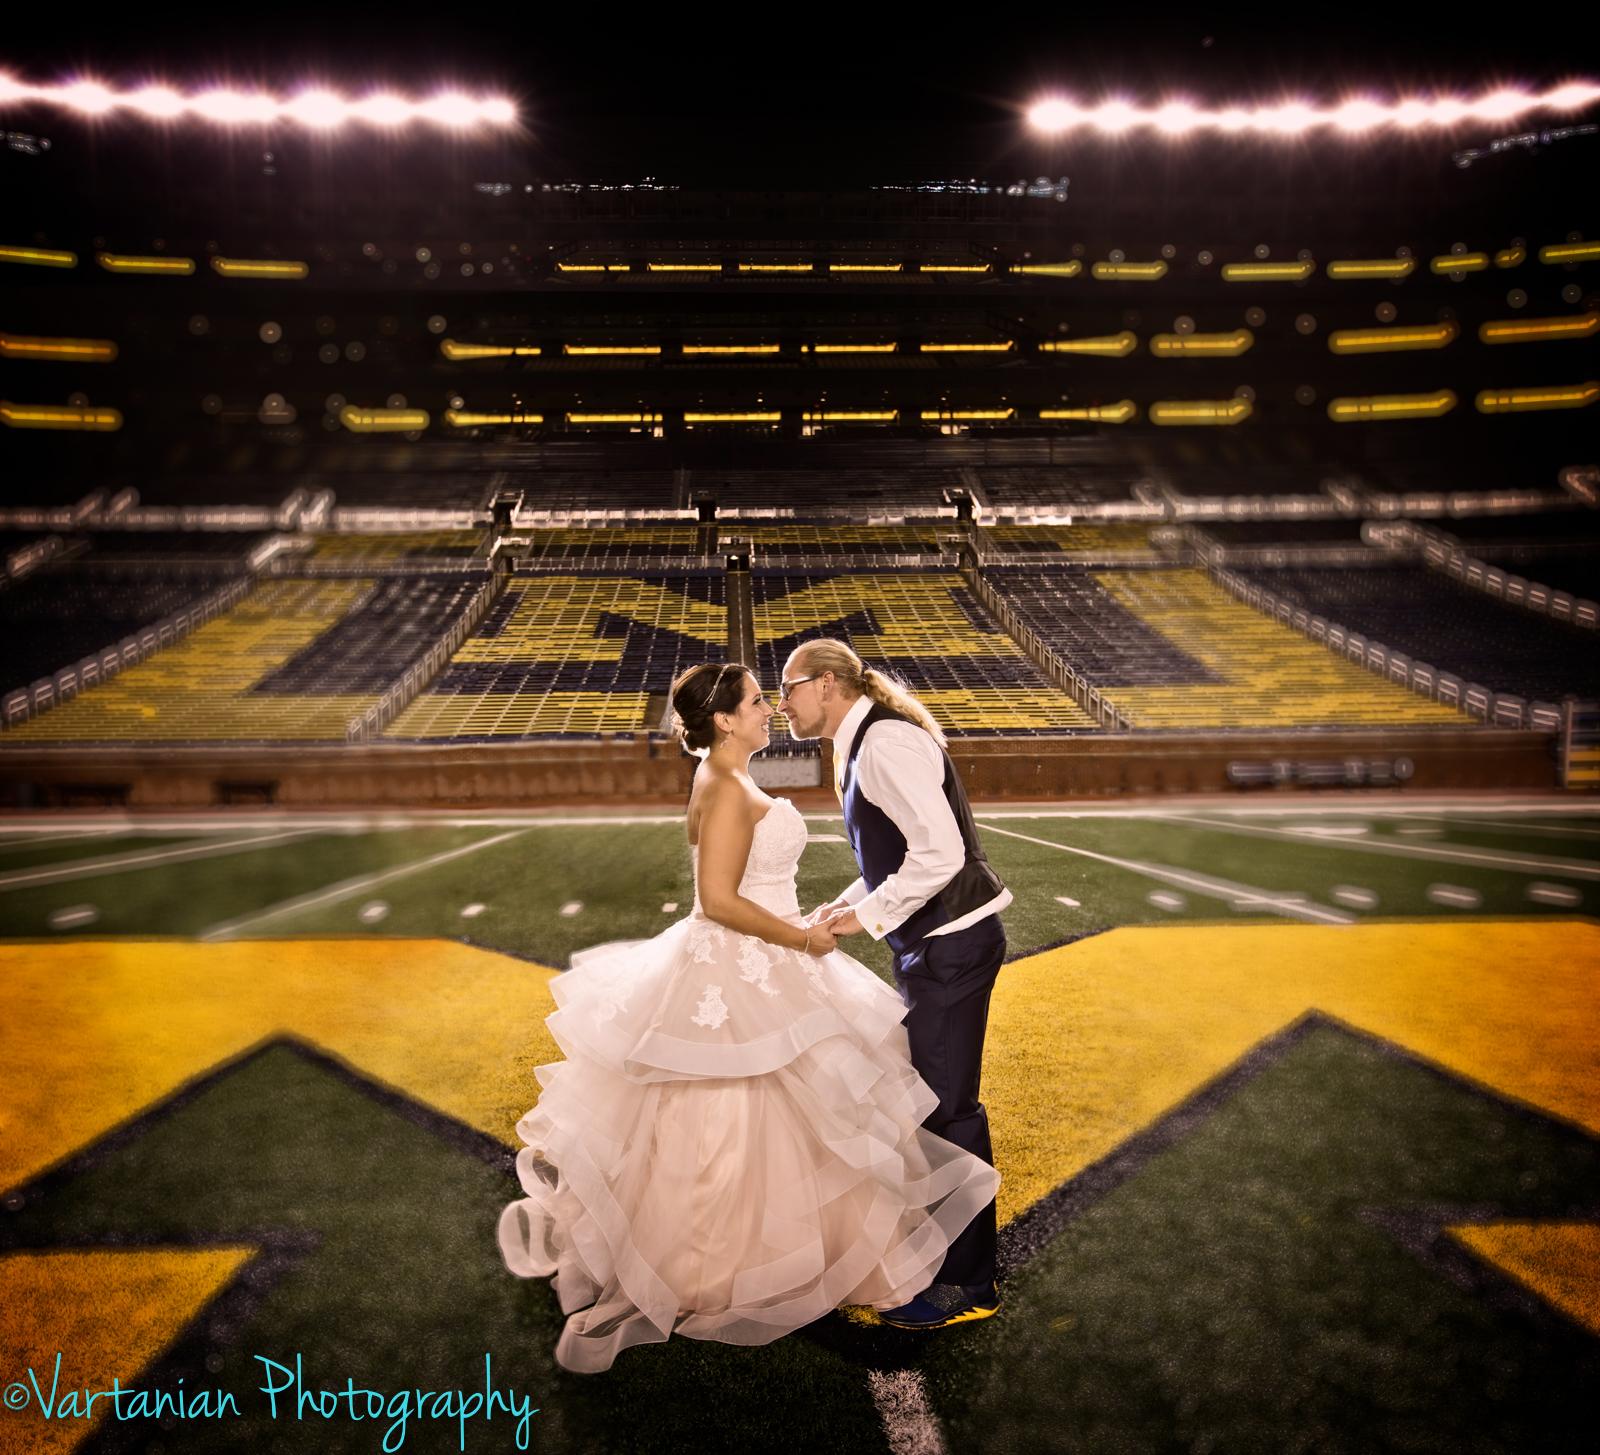 Sowers-Wedding-at-U-of-m-stadium-Vartanian-photography.jpg